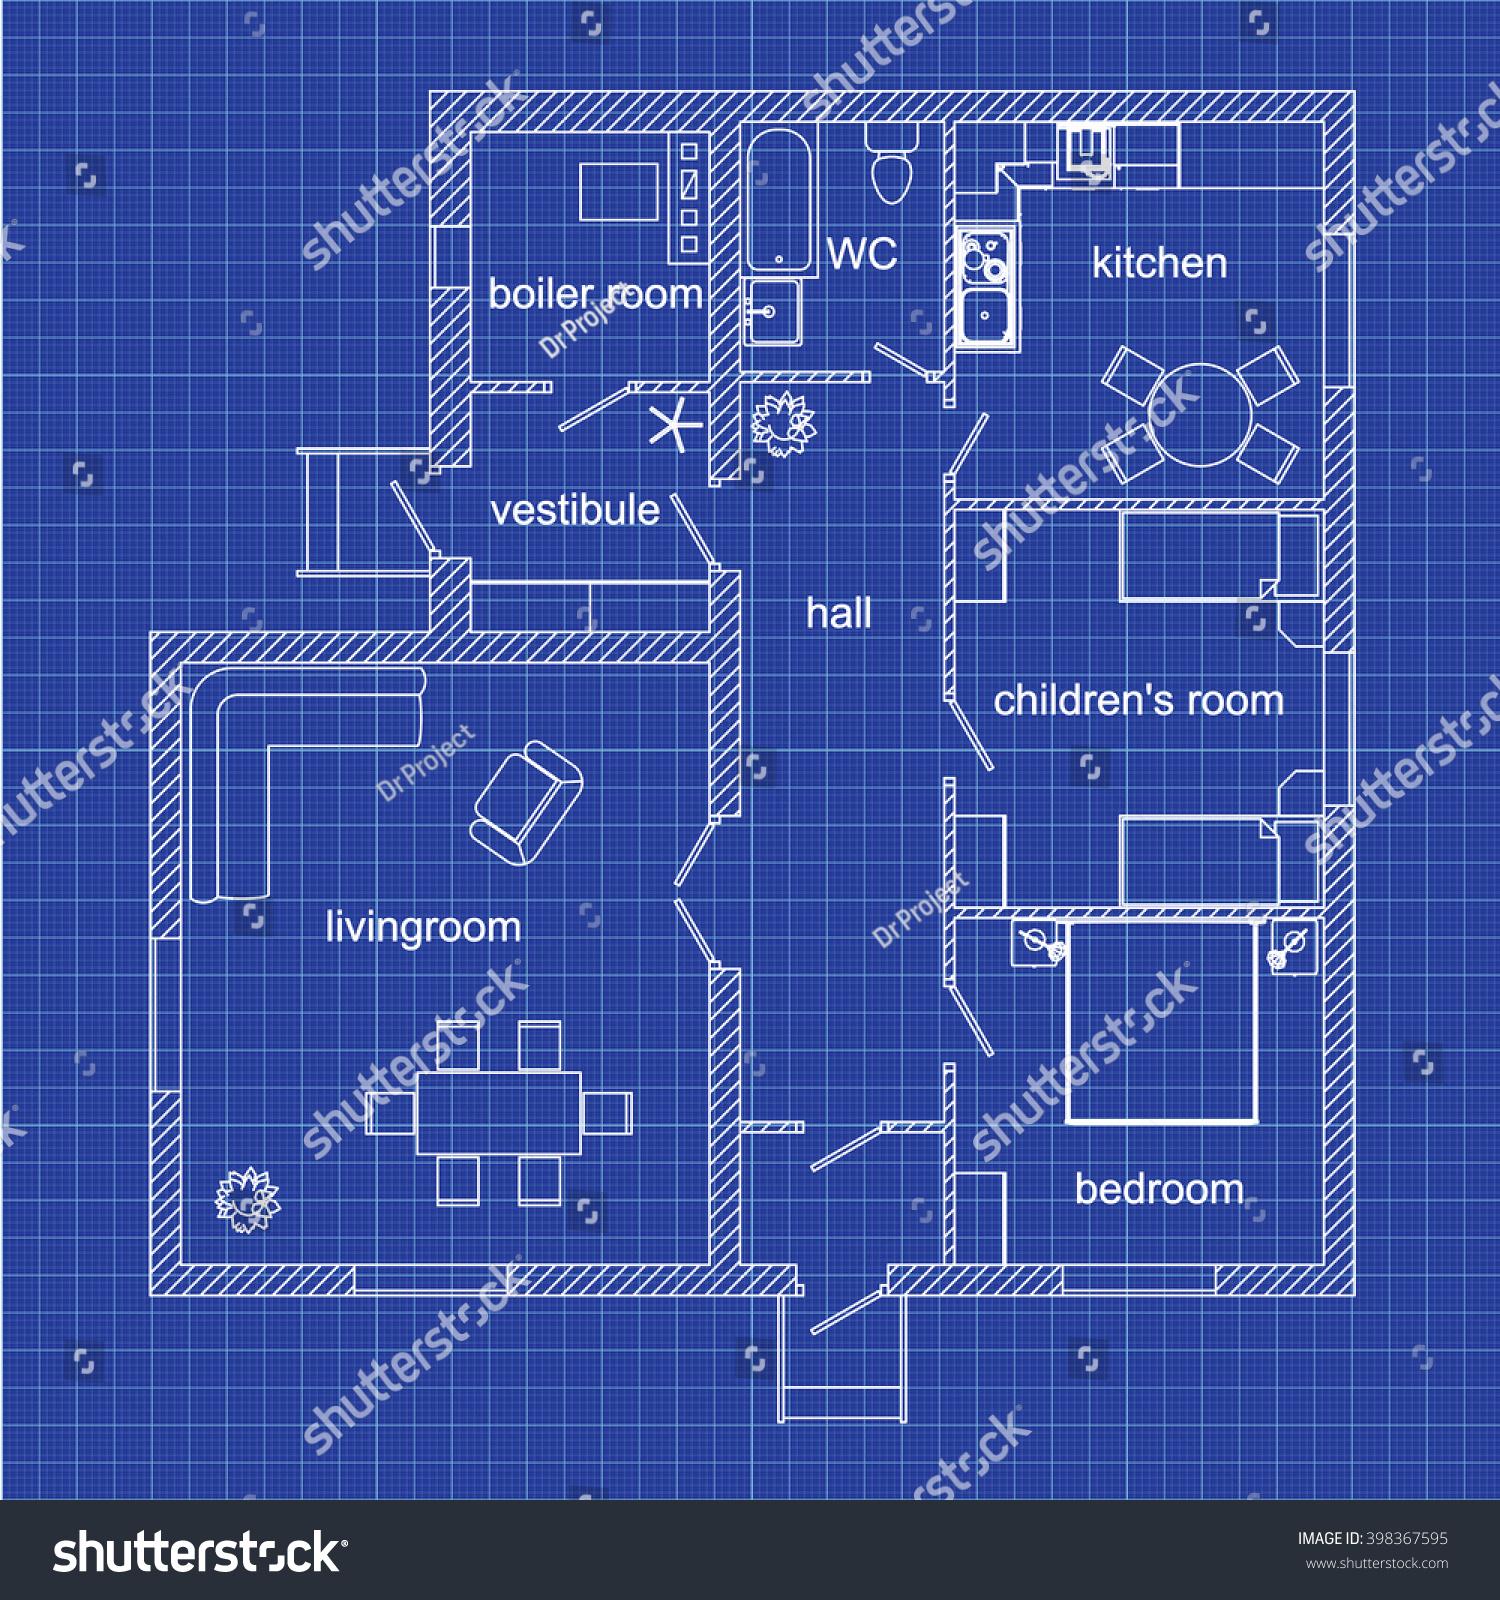 Blueprint floor plan modern apartment on stock vector 2018 blueprint floor plan of a modern apartment on graph paper vector illustration malvernweather Gallery